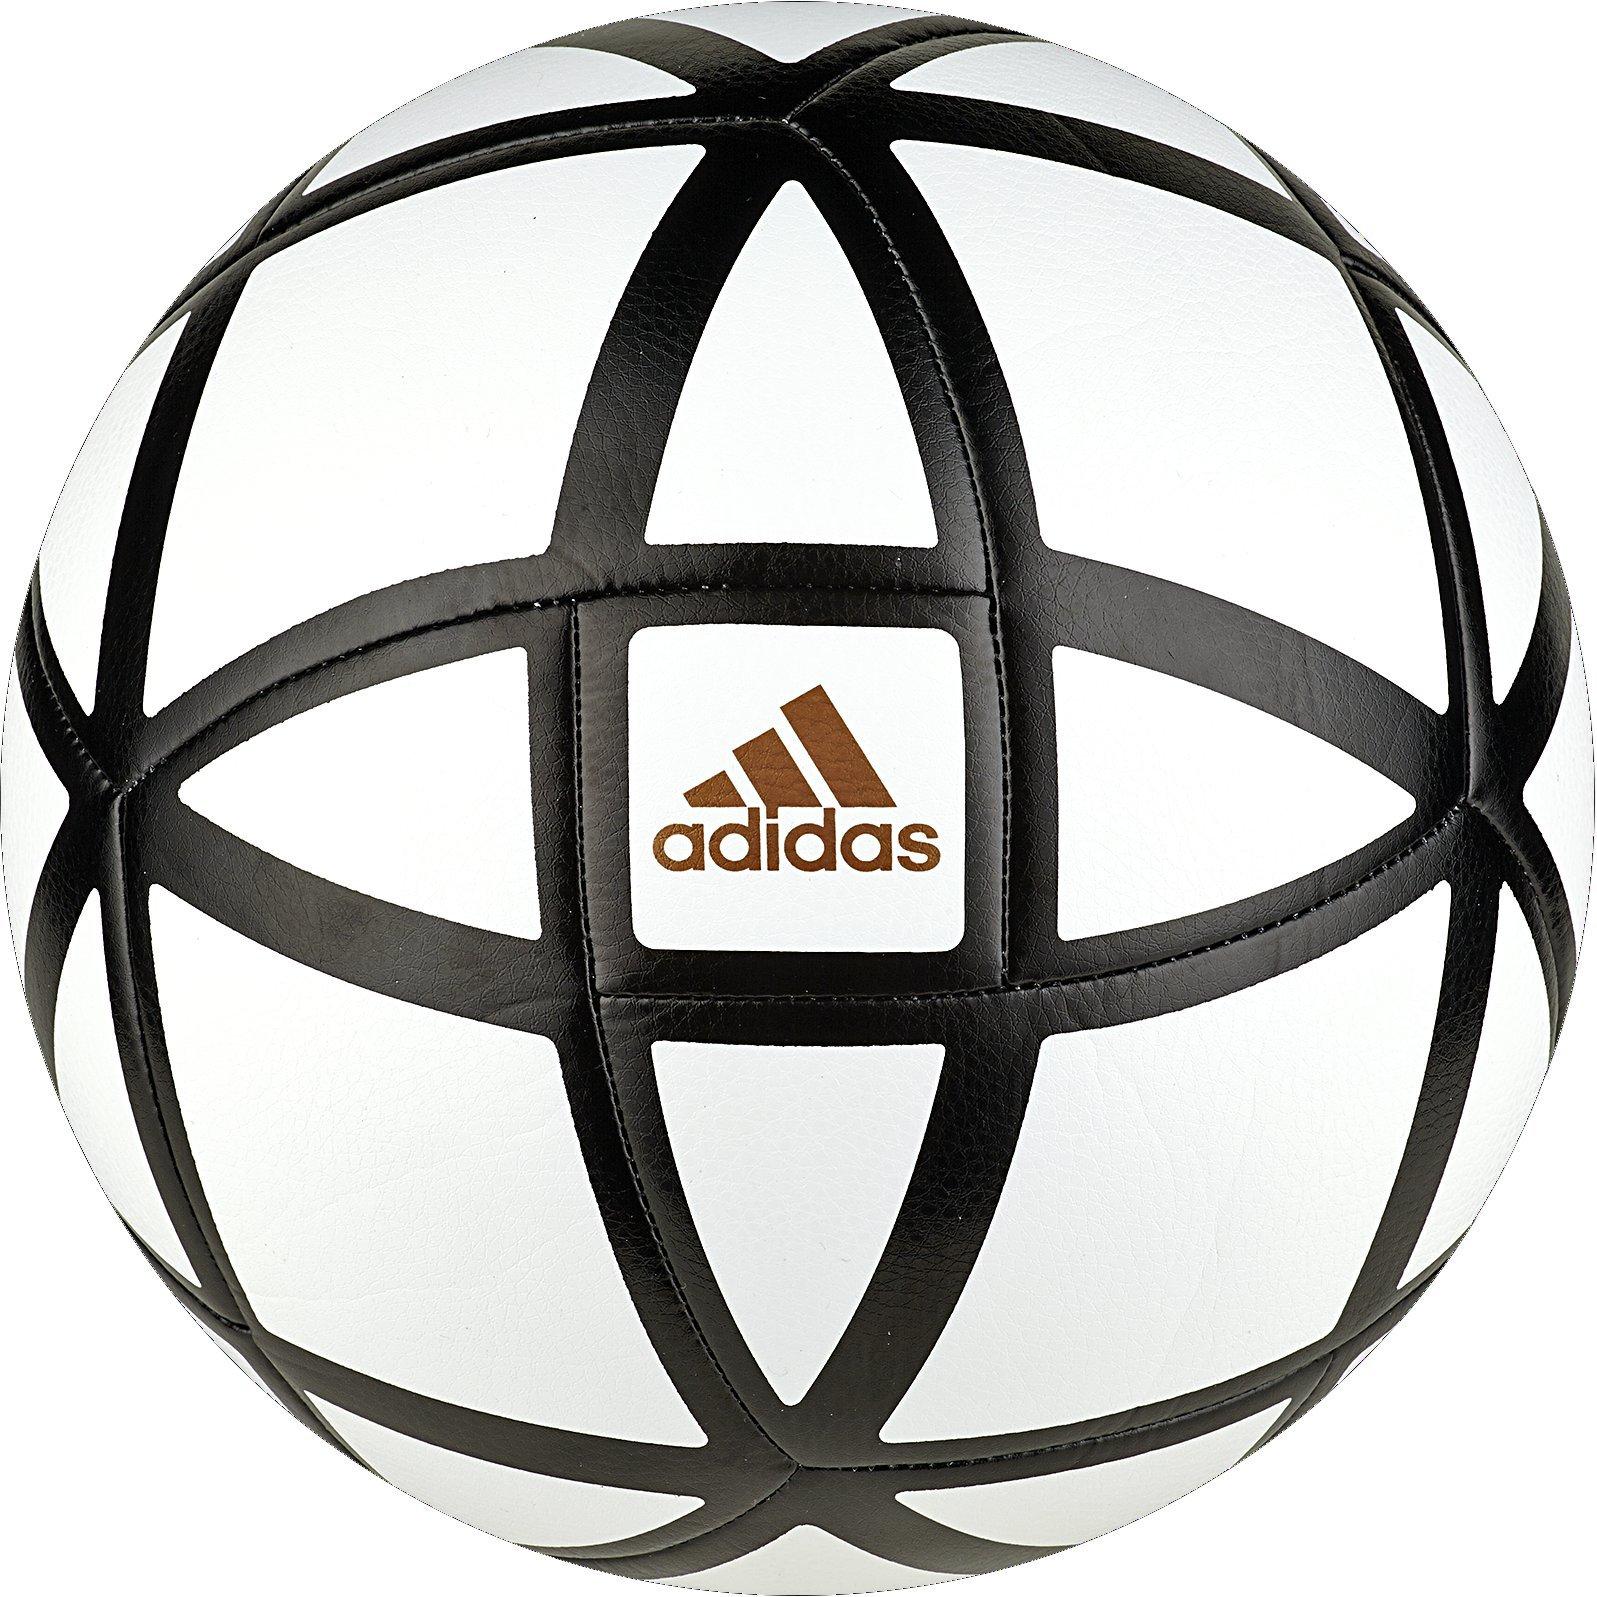 e14b7881 adidas Glider Soccer Ball, White/Black, Size 4